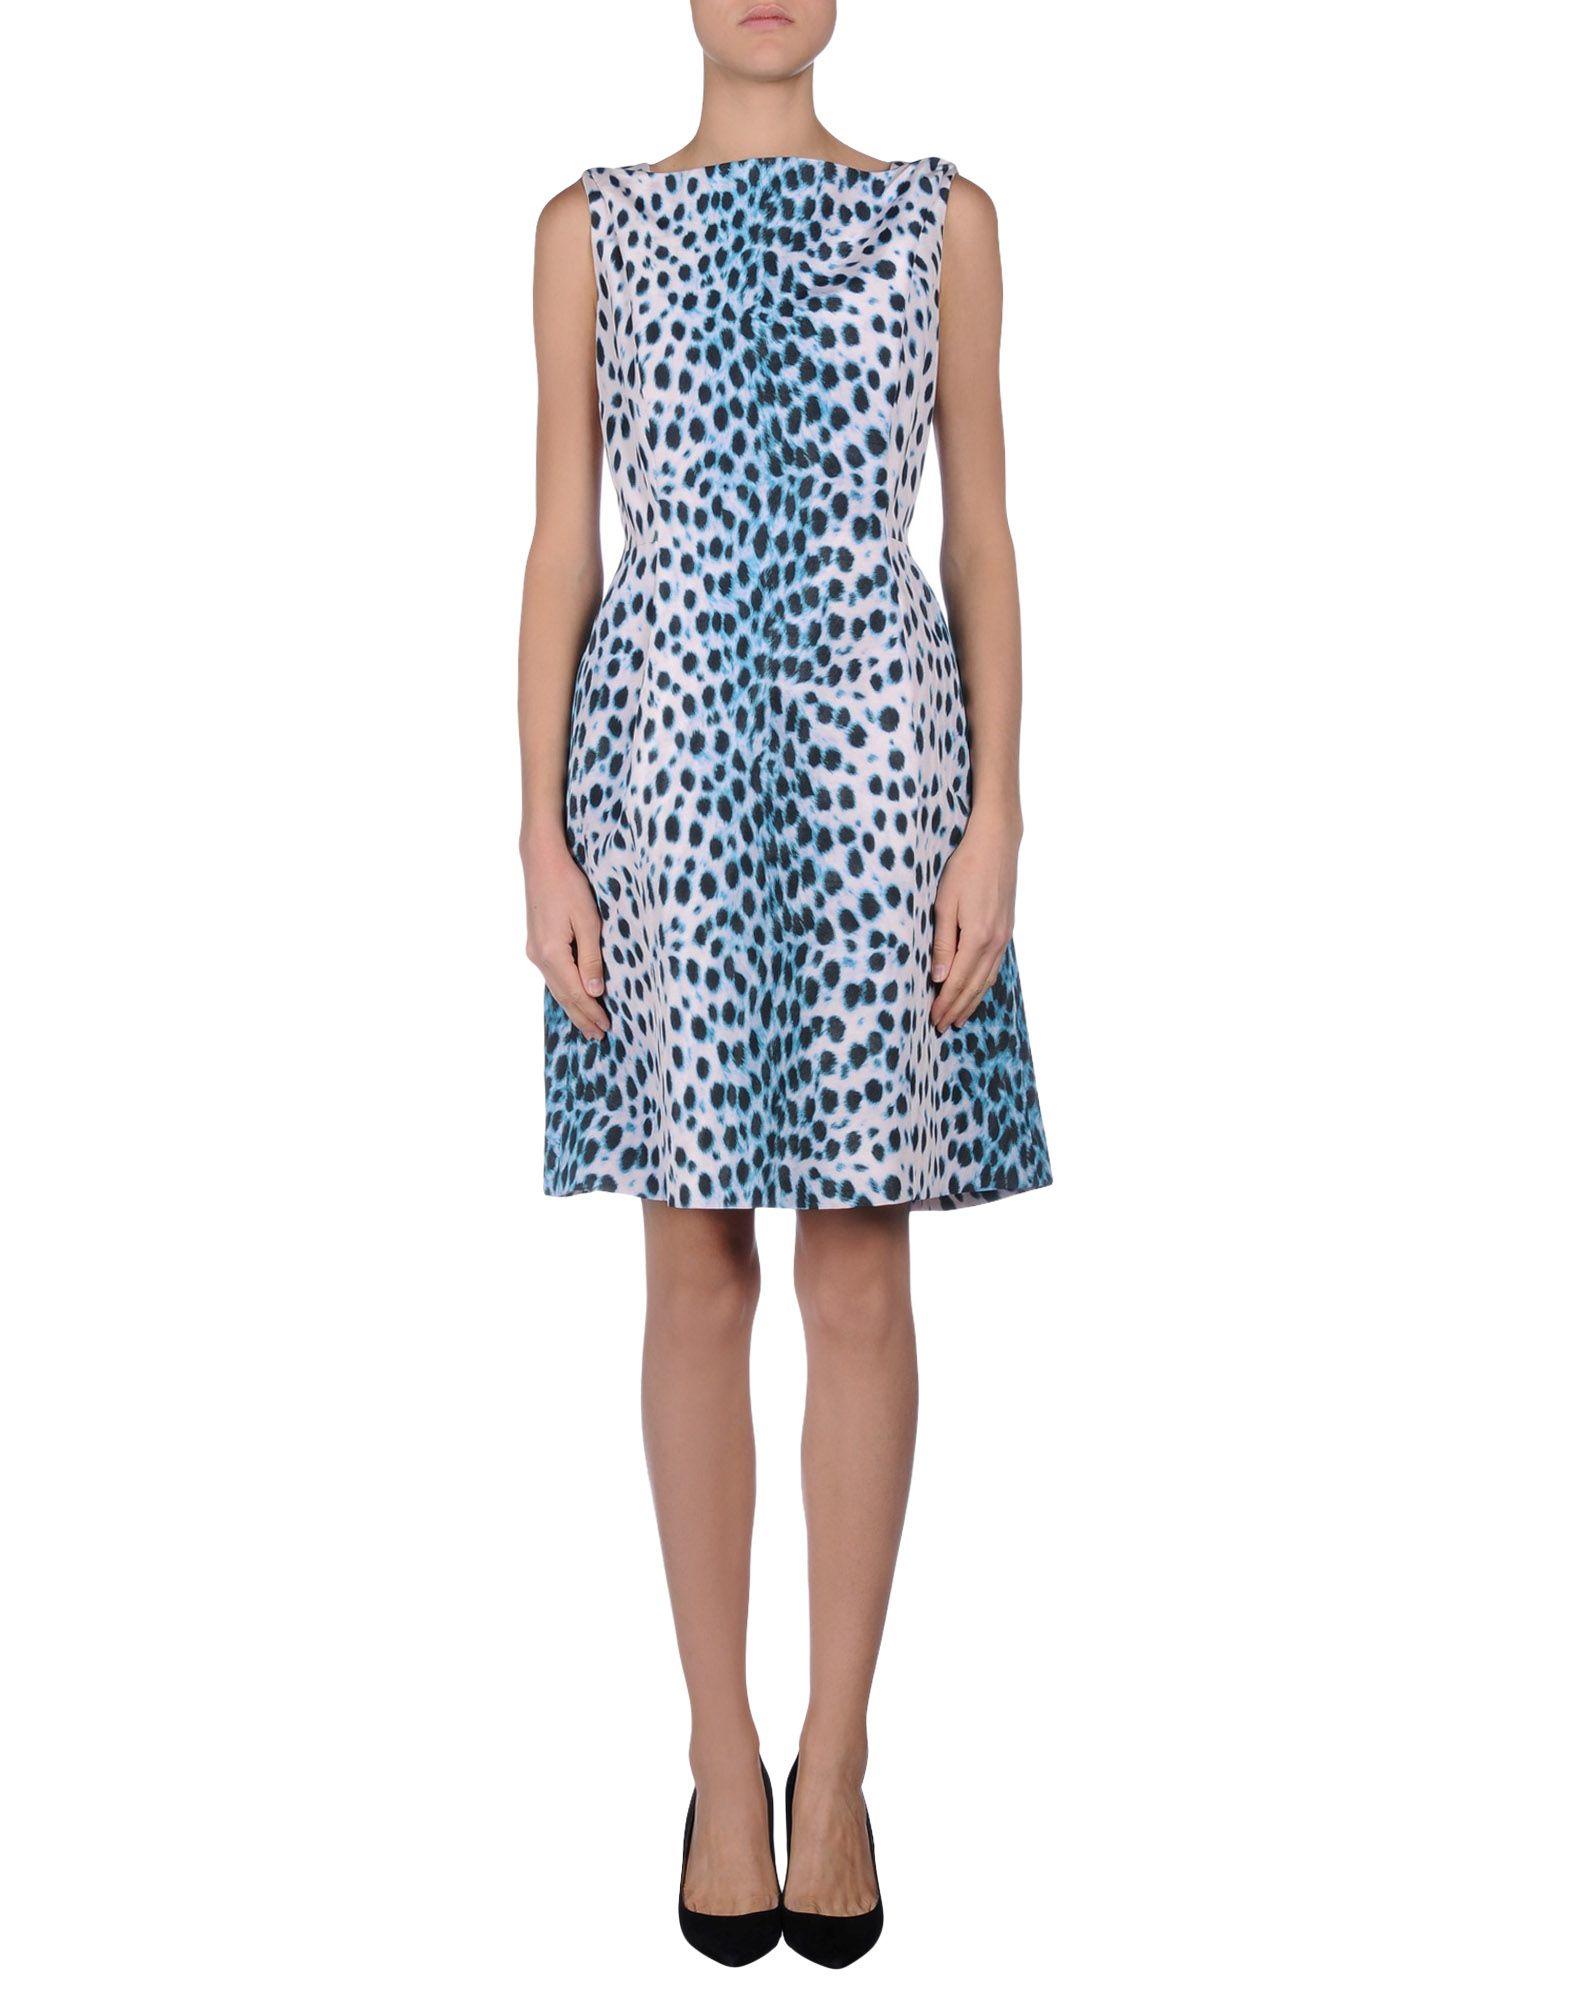 dior short dresses - photo #6